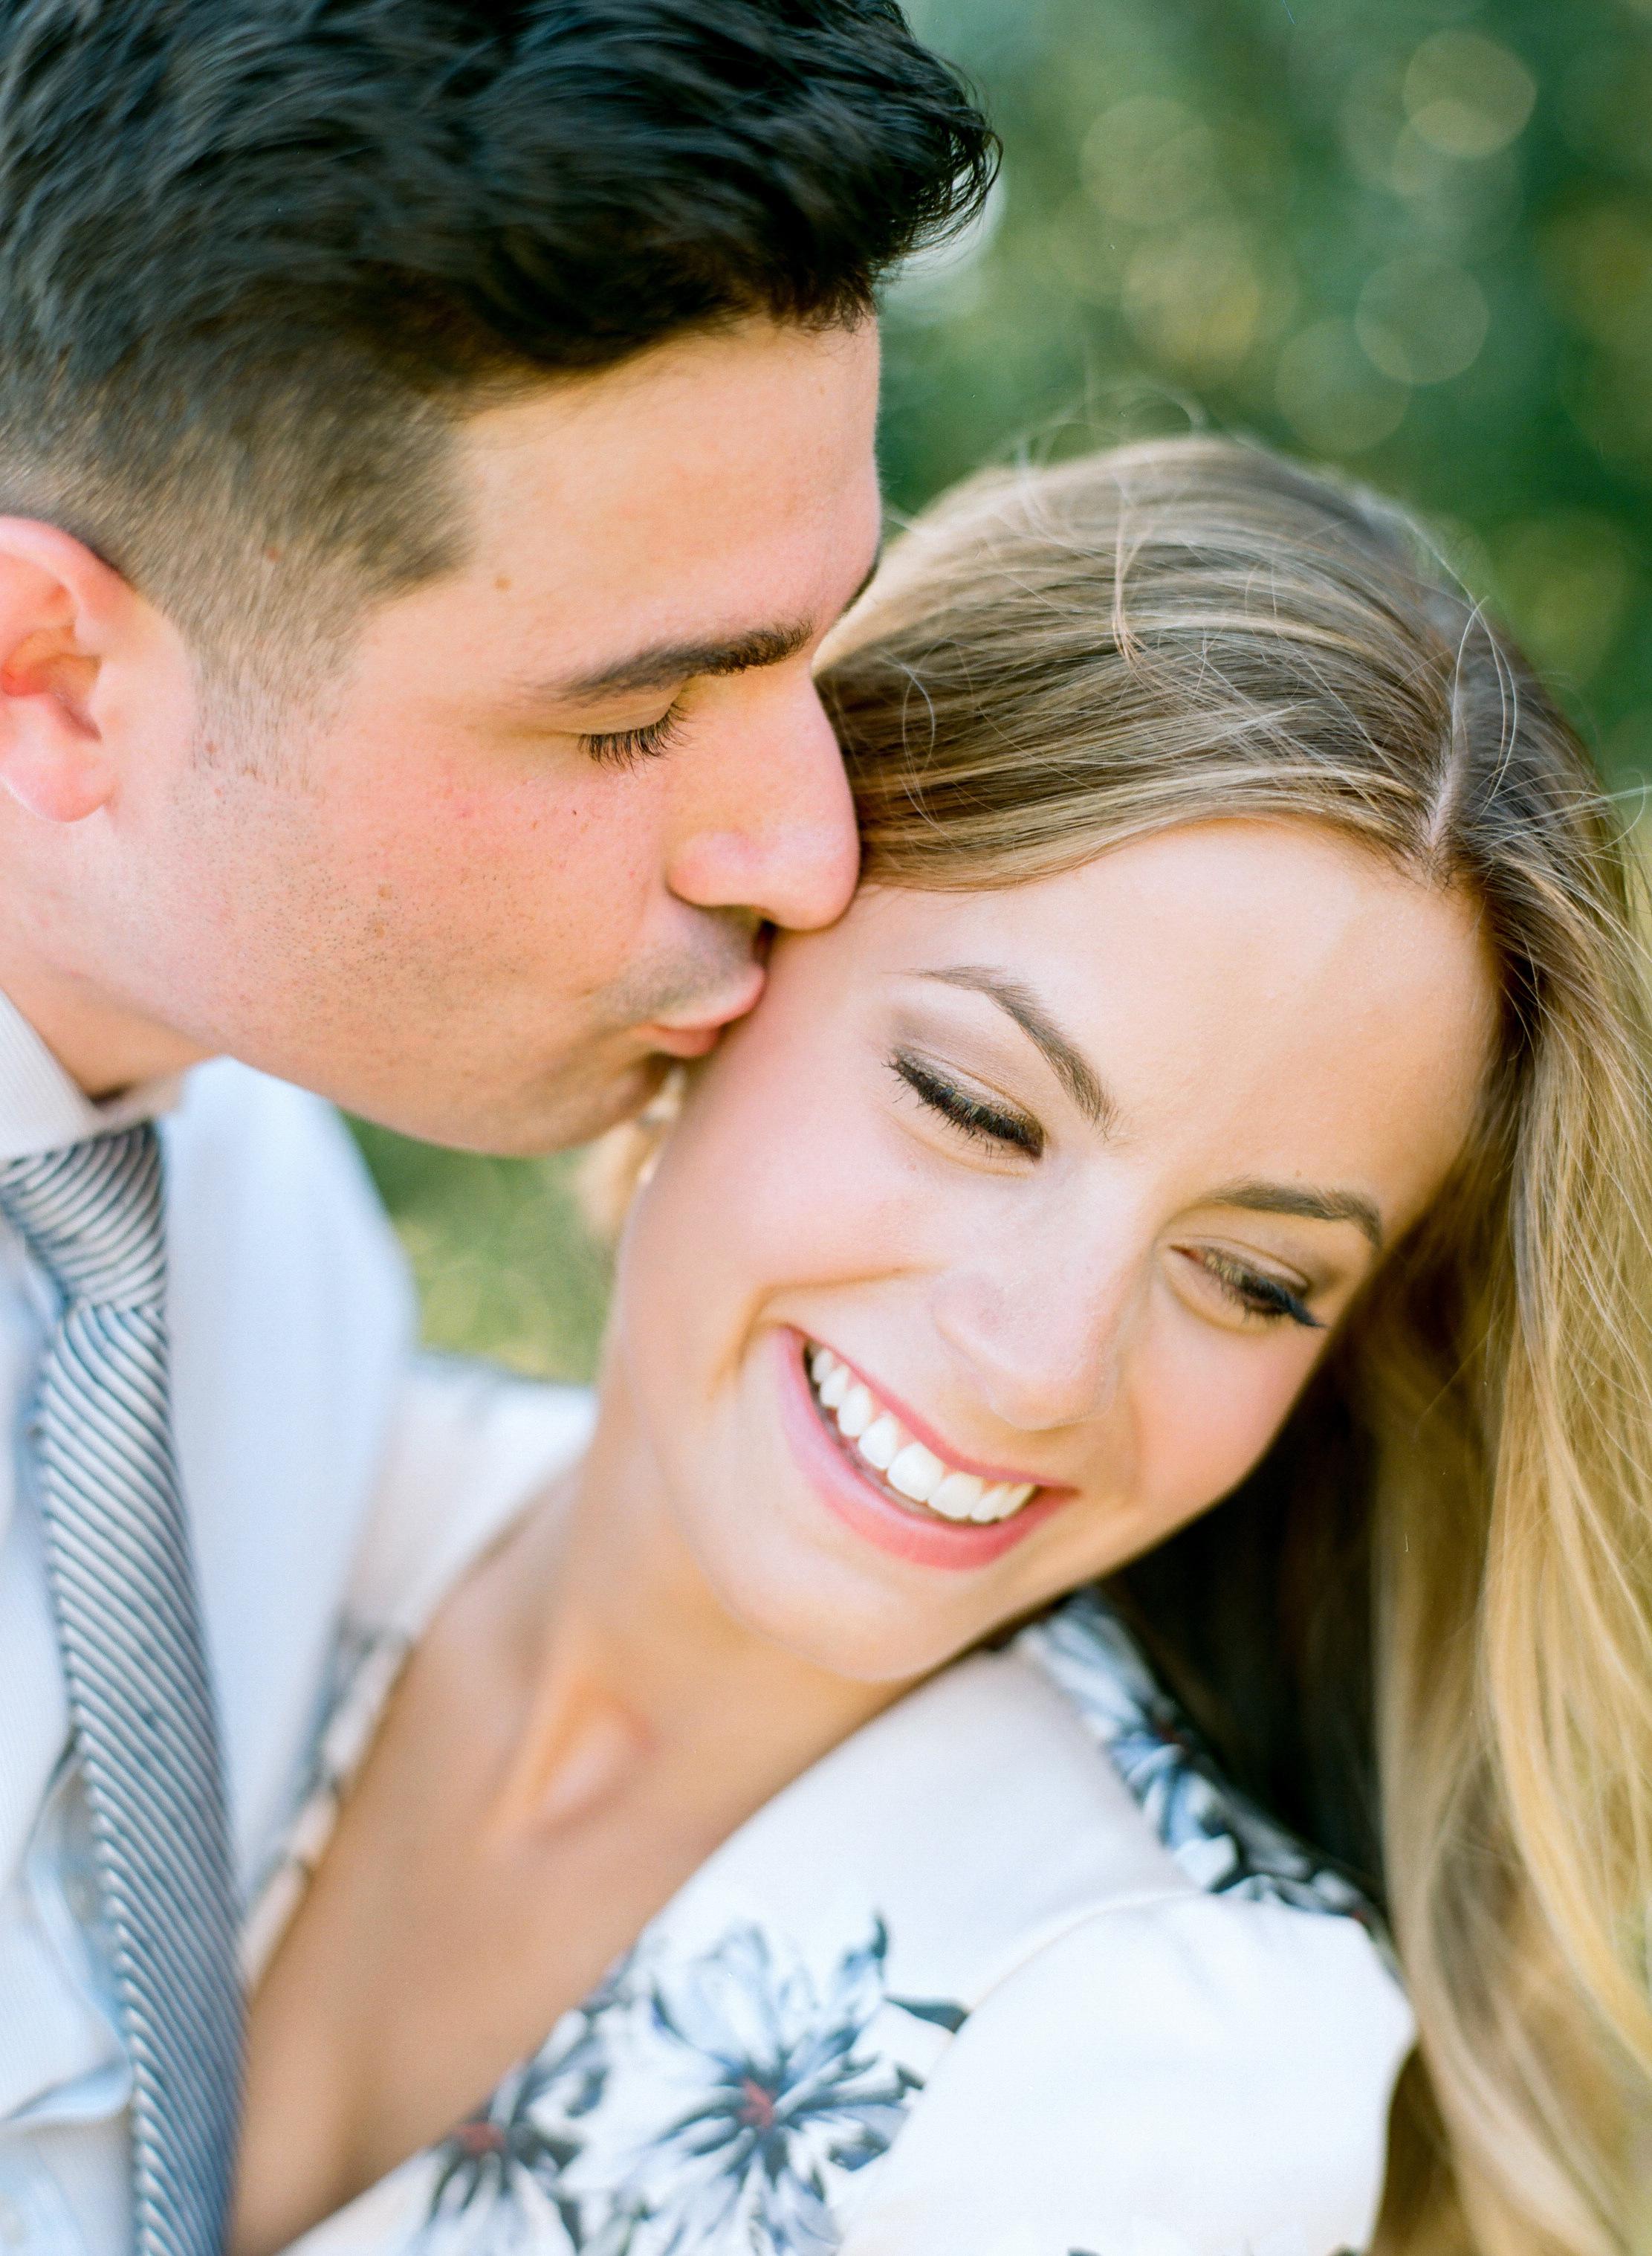 Dana-Fernandez-Photography-Houston-Engagement-Wedding-Film-Photographer-12.jpg